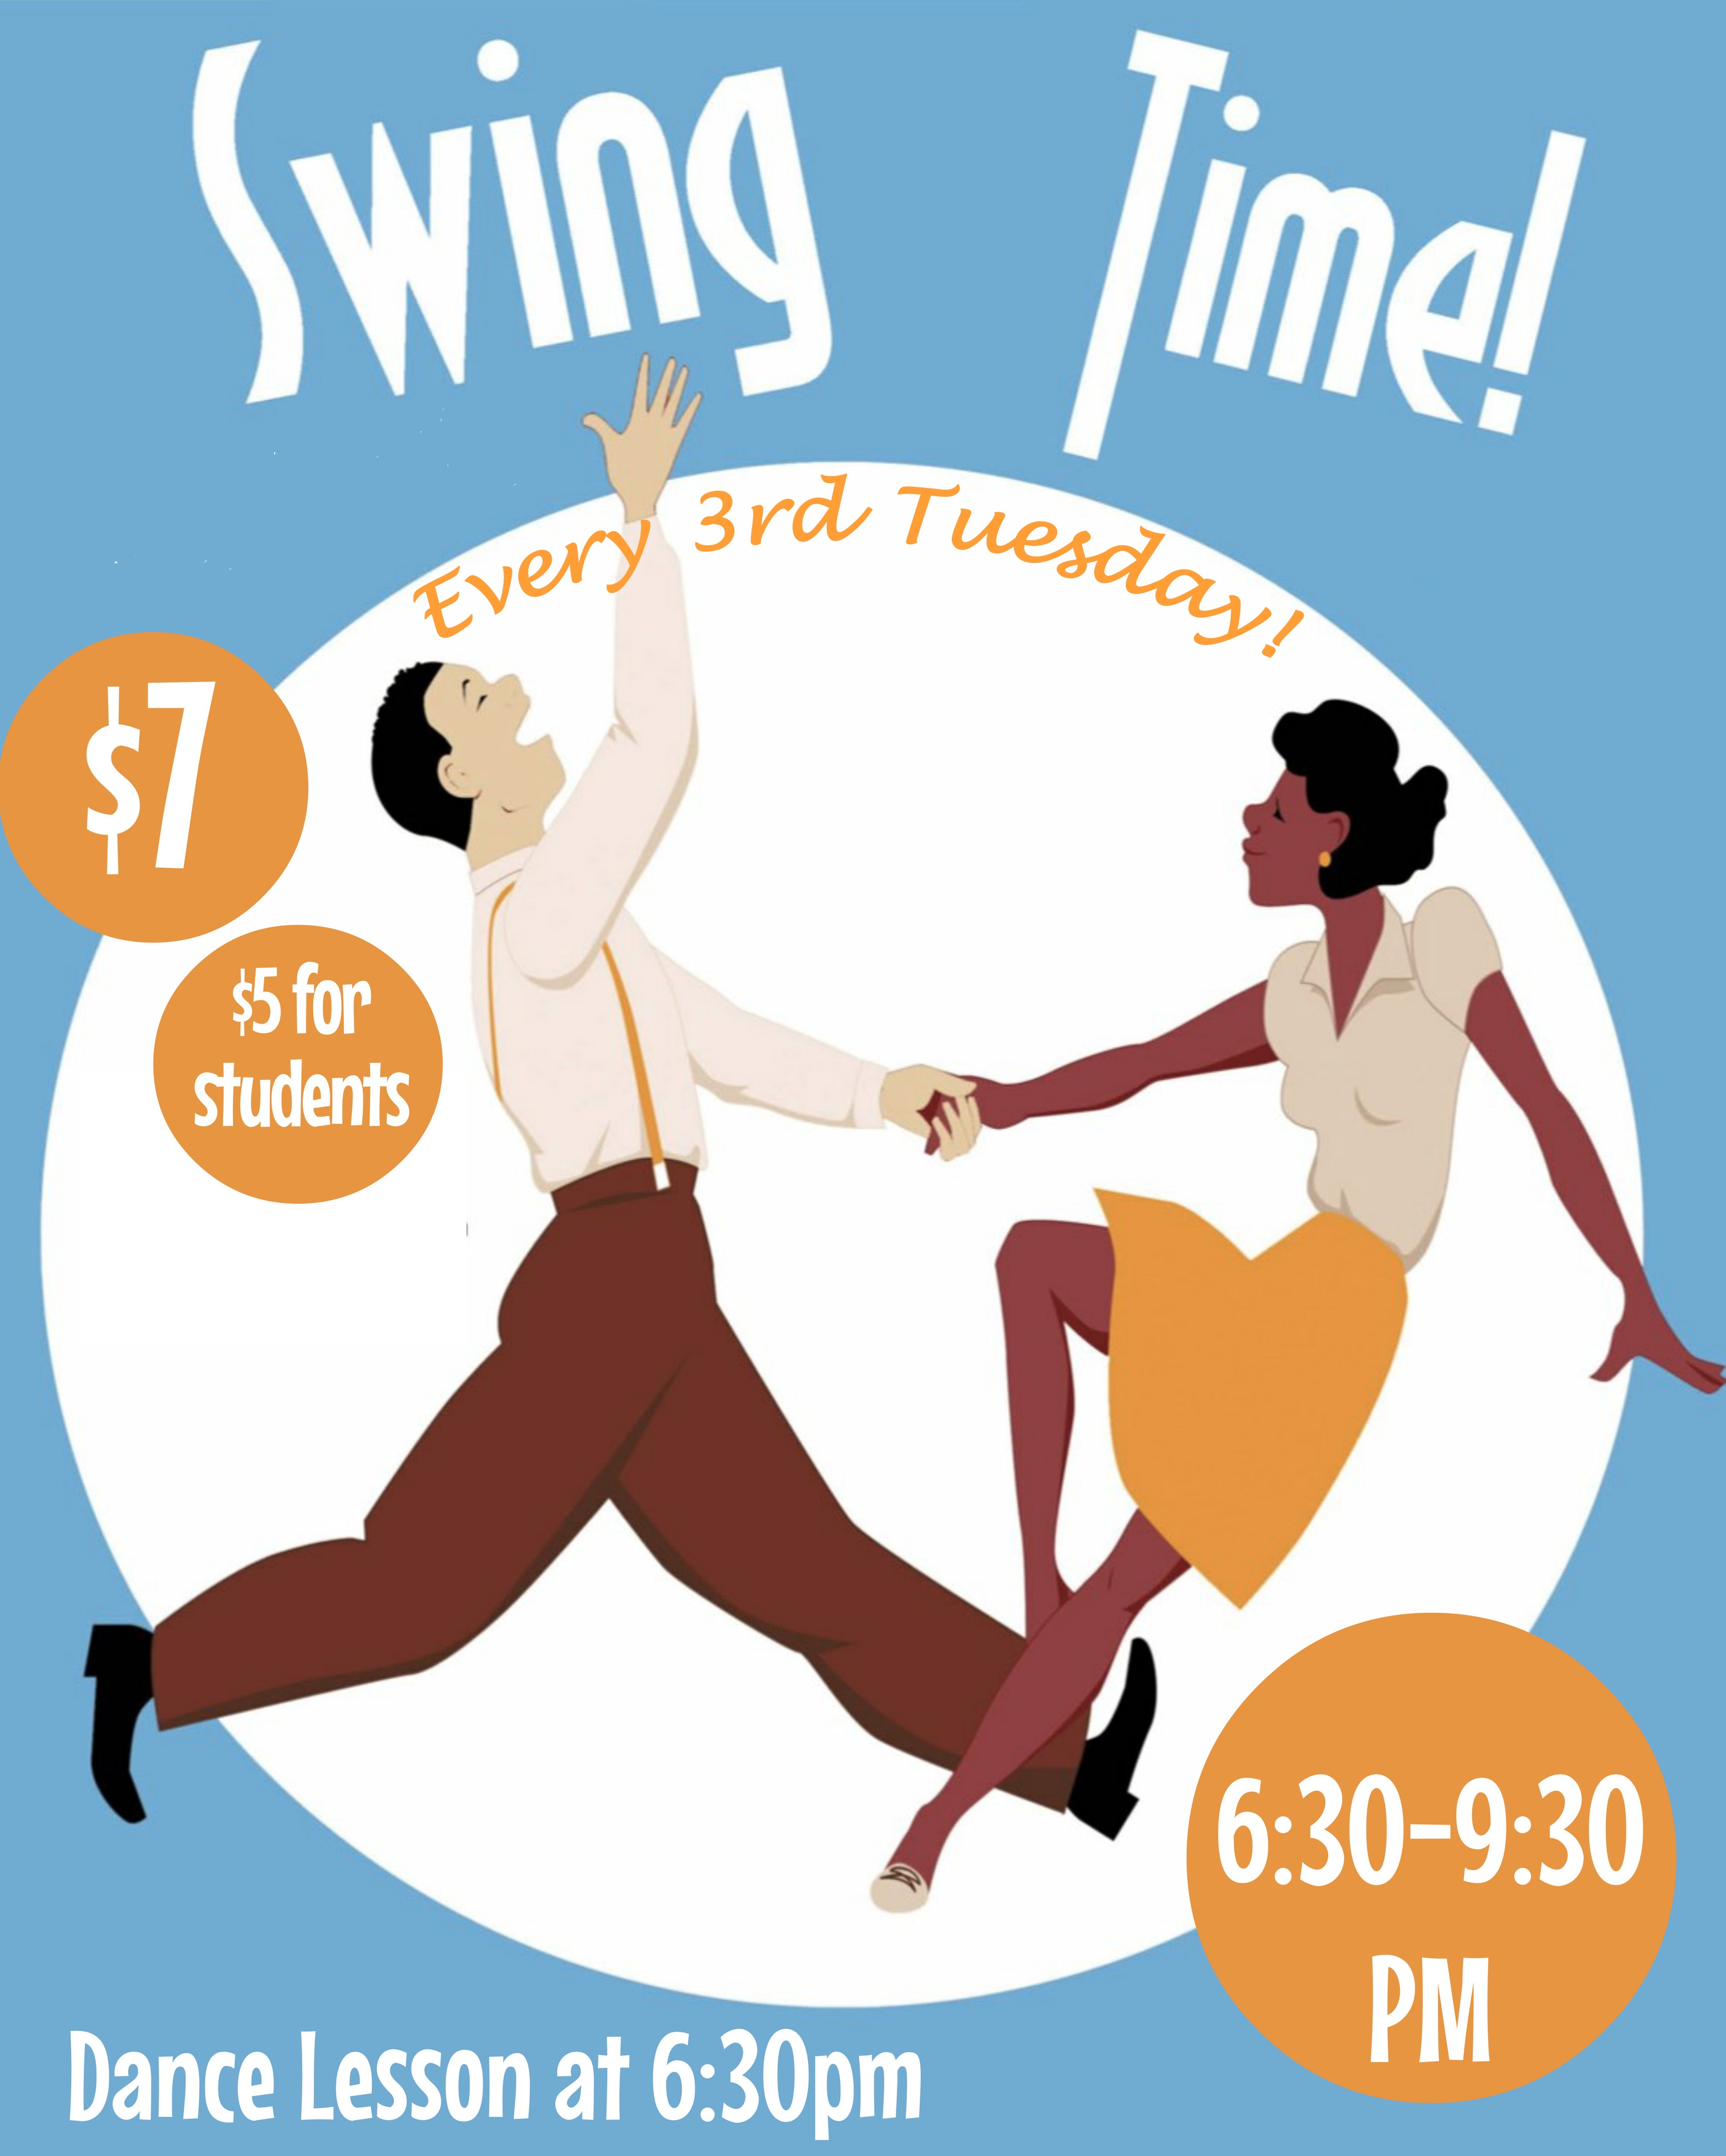 swing dance ithaca commons live music ballroom team cornell ithaca college university lindy hop foxtrot waltz east west coast range